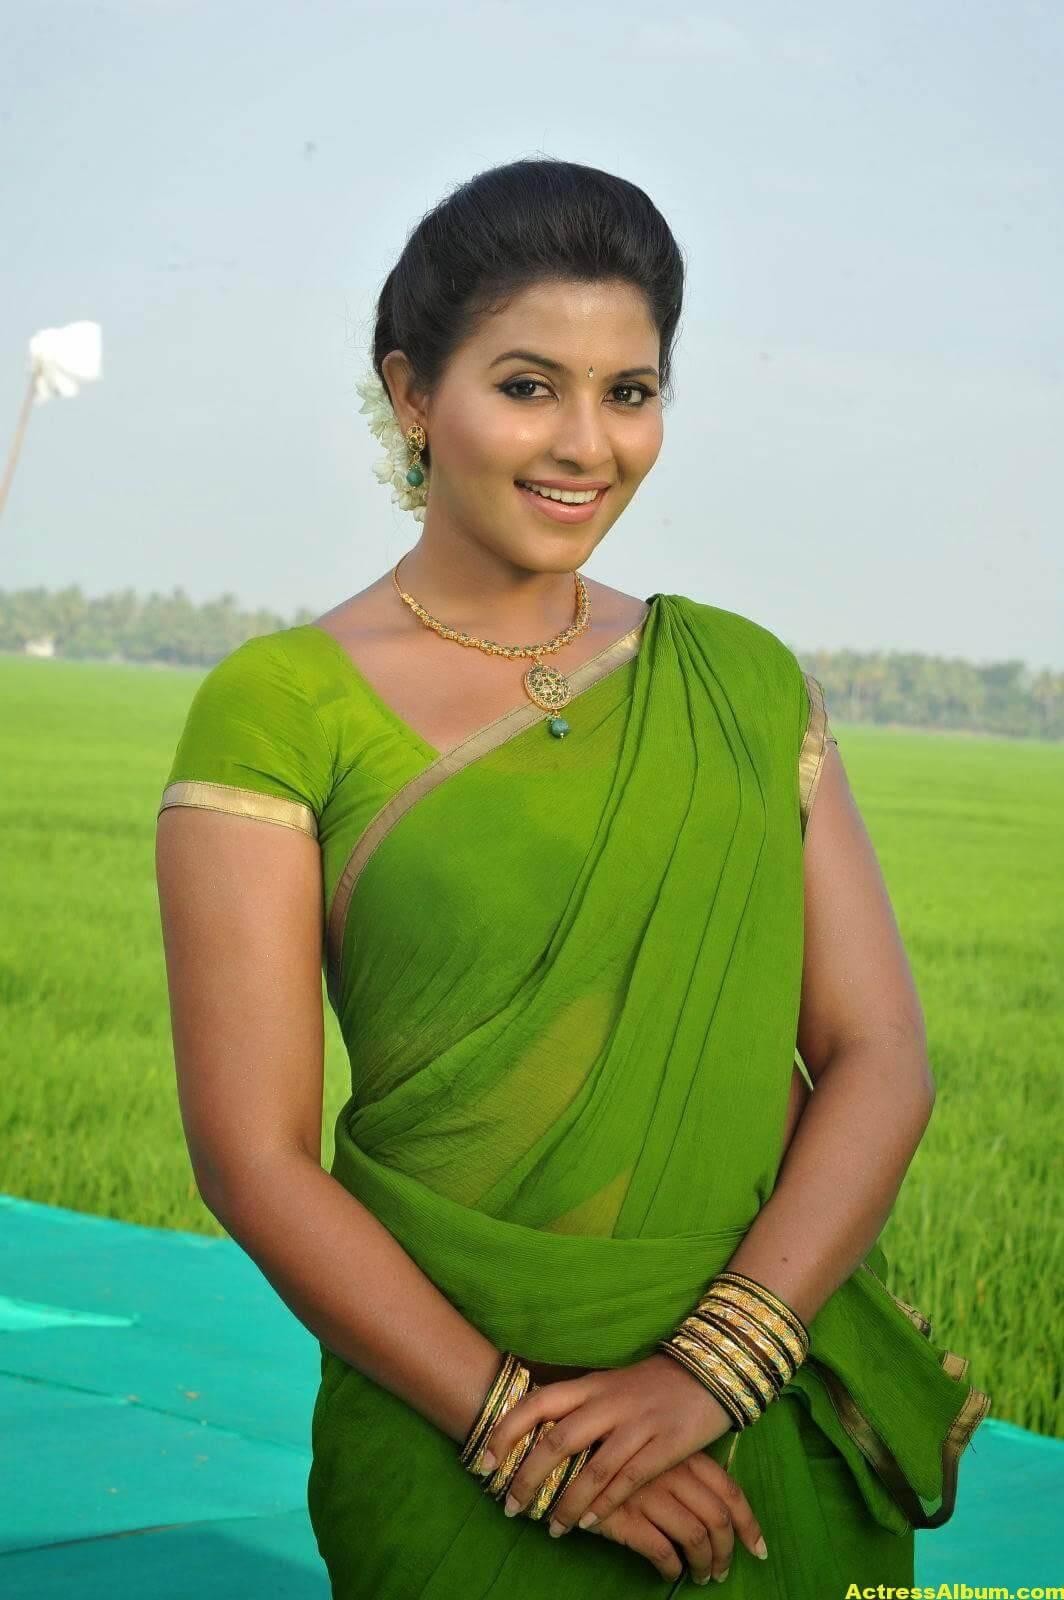 Meena Cute Wallpapers Anjali Cute Photos Stills In Spicy Green Saree Actress Album